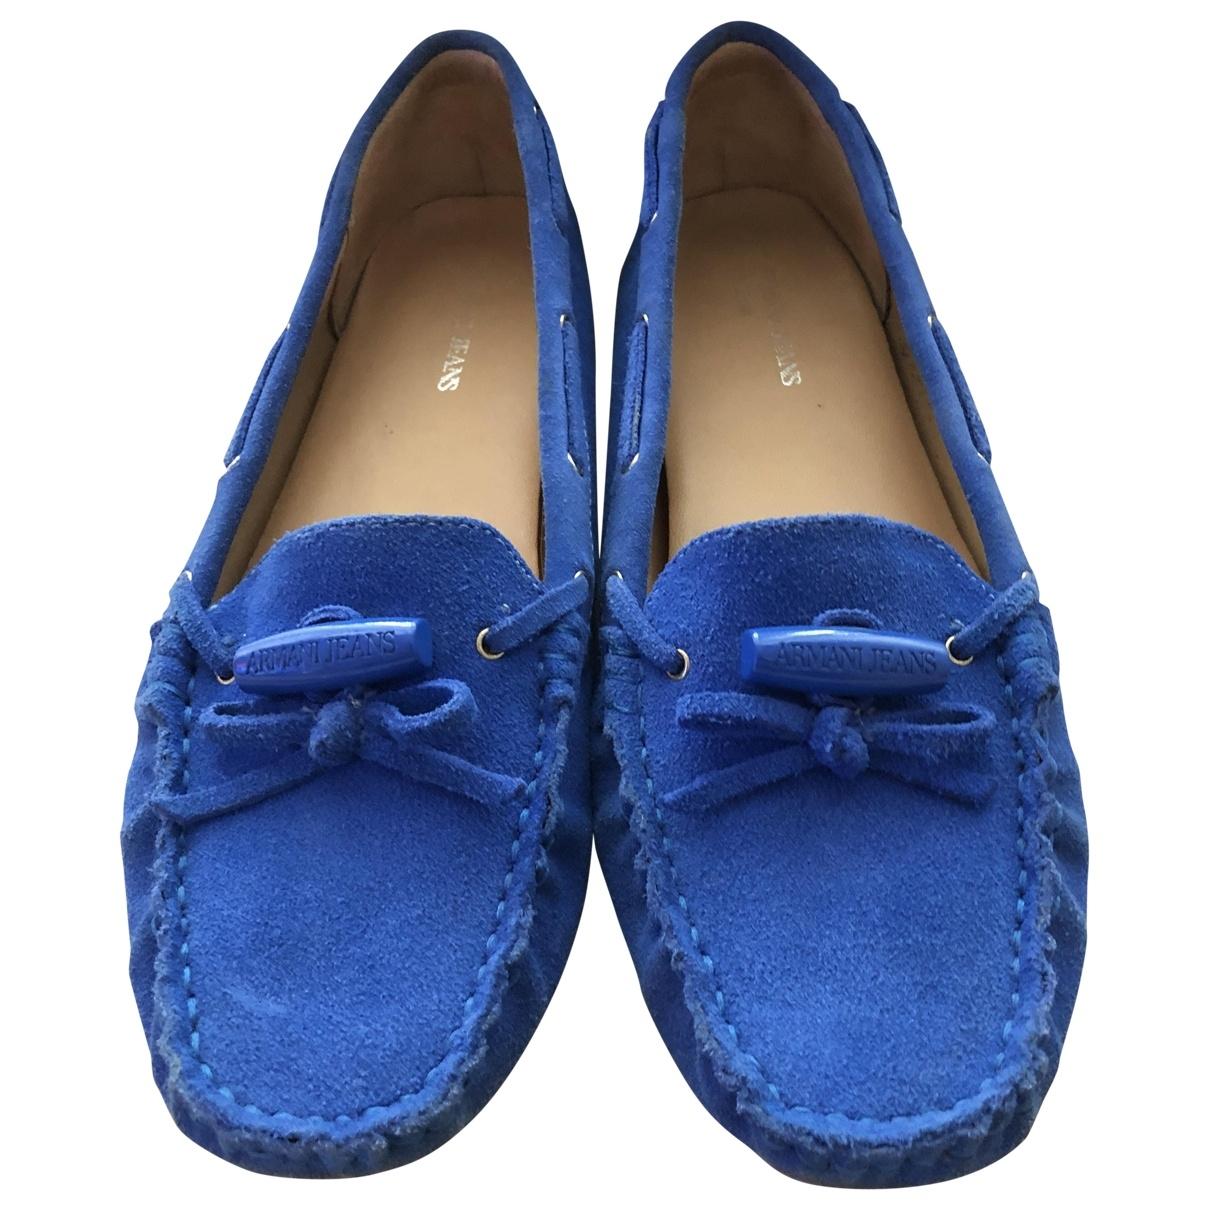 Armani Jeans \N Mokassins in  Blau Veloursleder